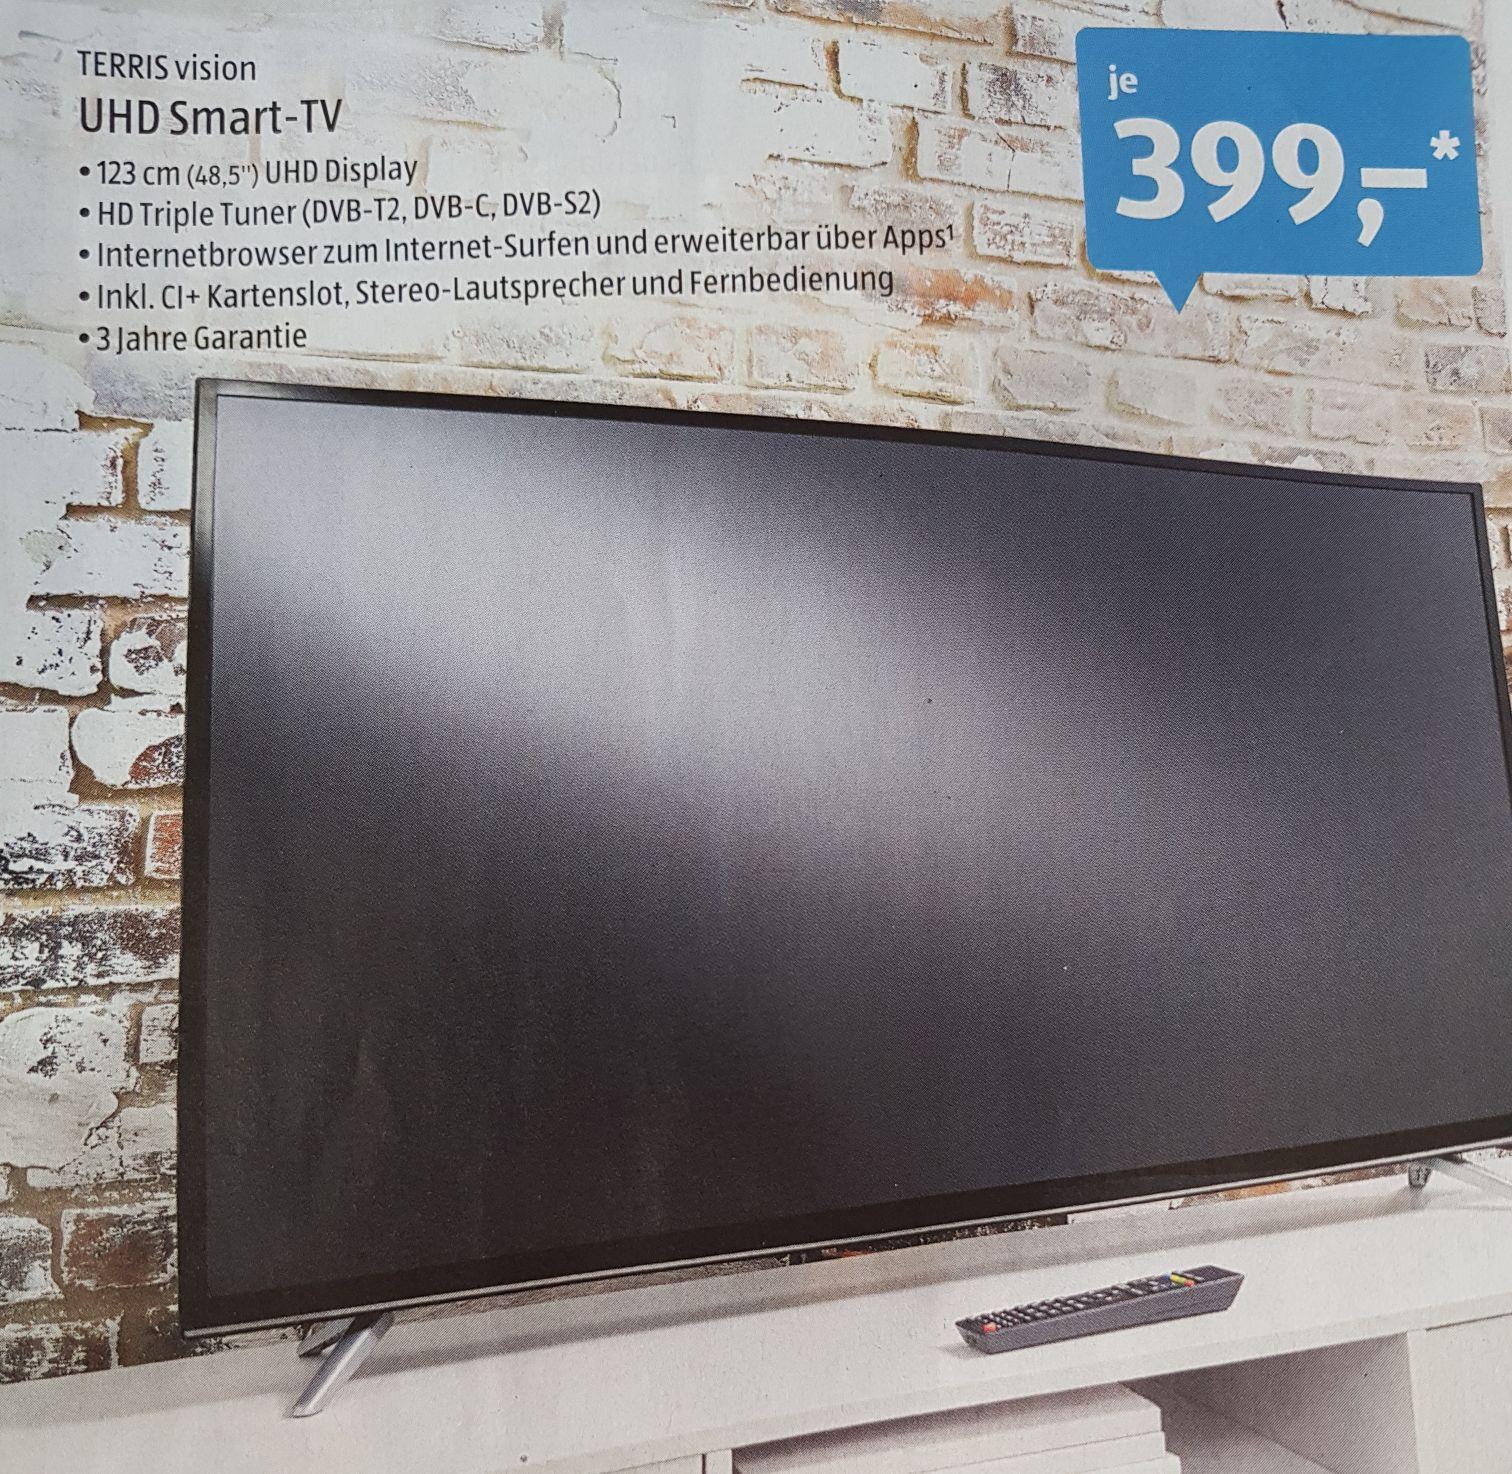 [Aldi Süd] Terris vision UHD Smart TV 48,5 Zoll